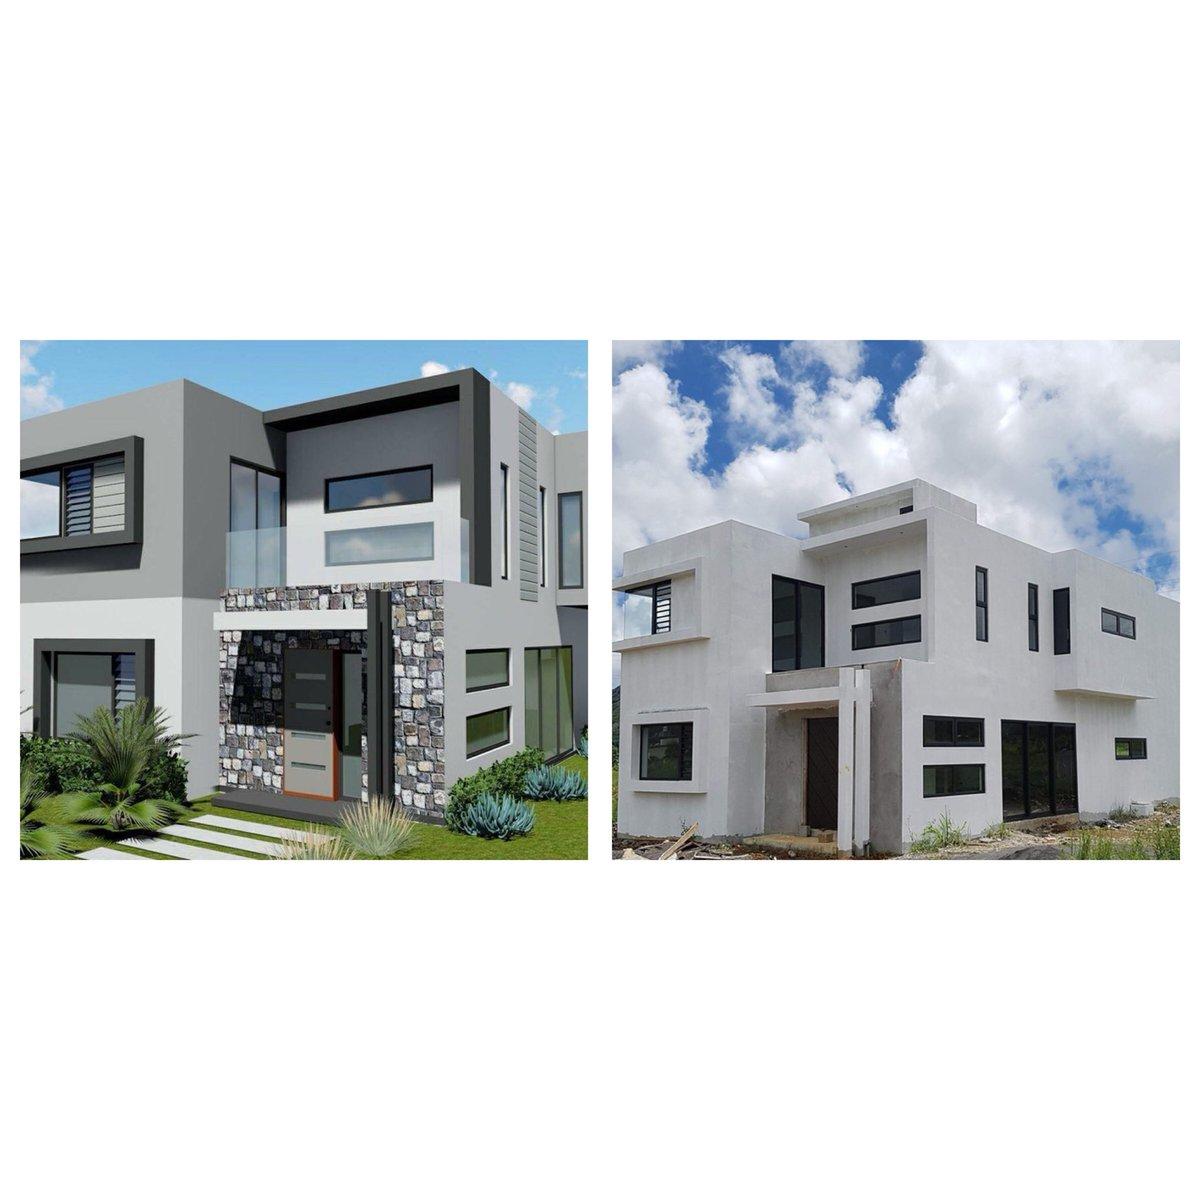 L8 l8studio design architecture mauritius residential stpierre mauritianarchitecture mauritianarchitect cubic modernhouse contemporaryhouse